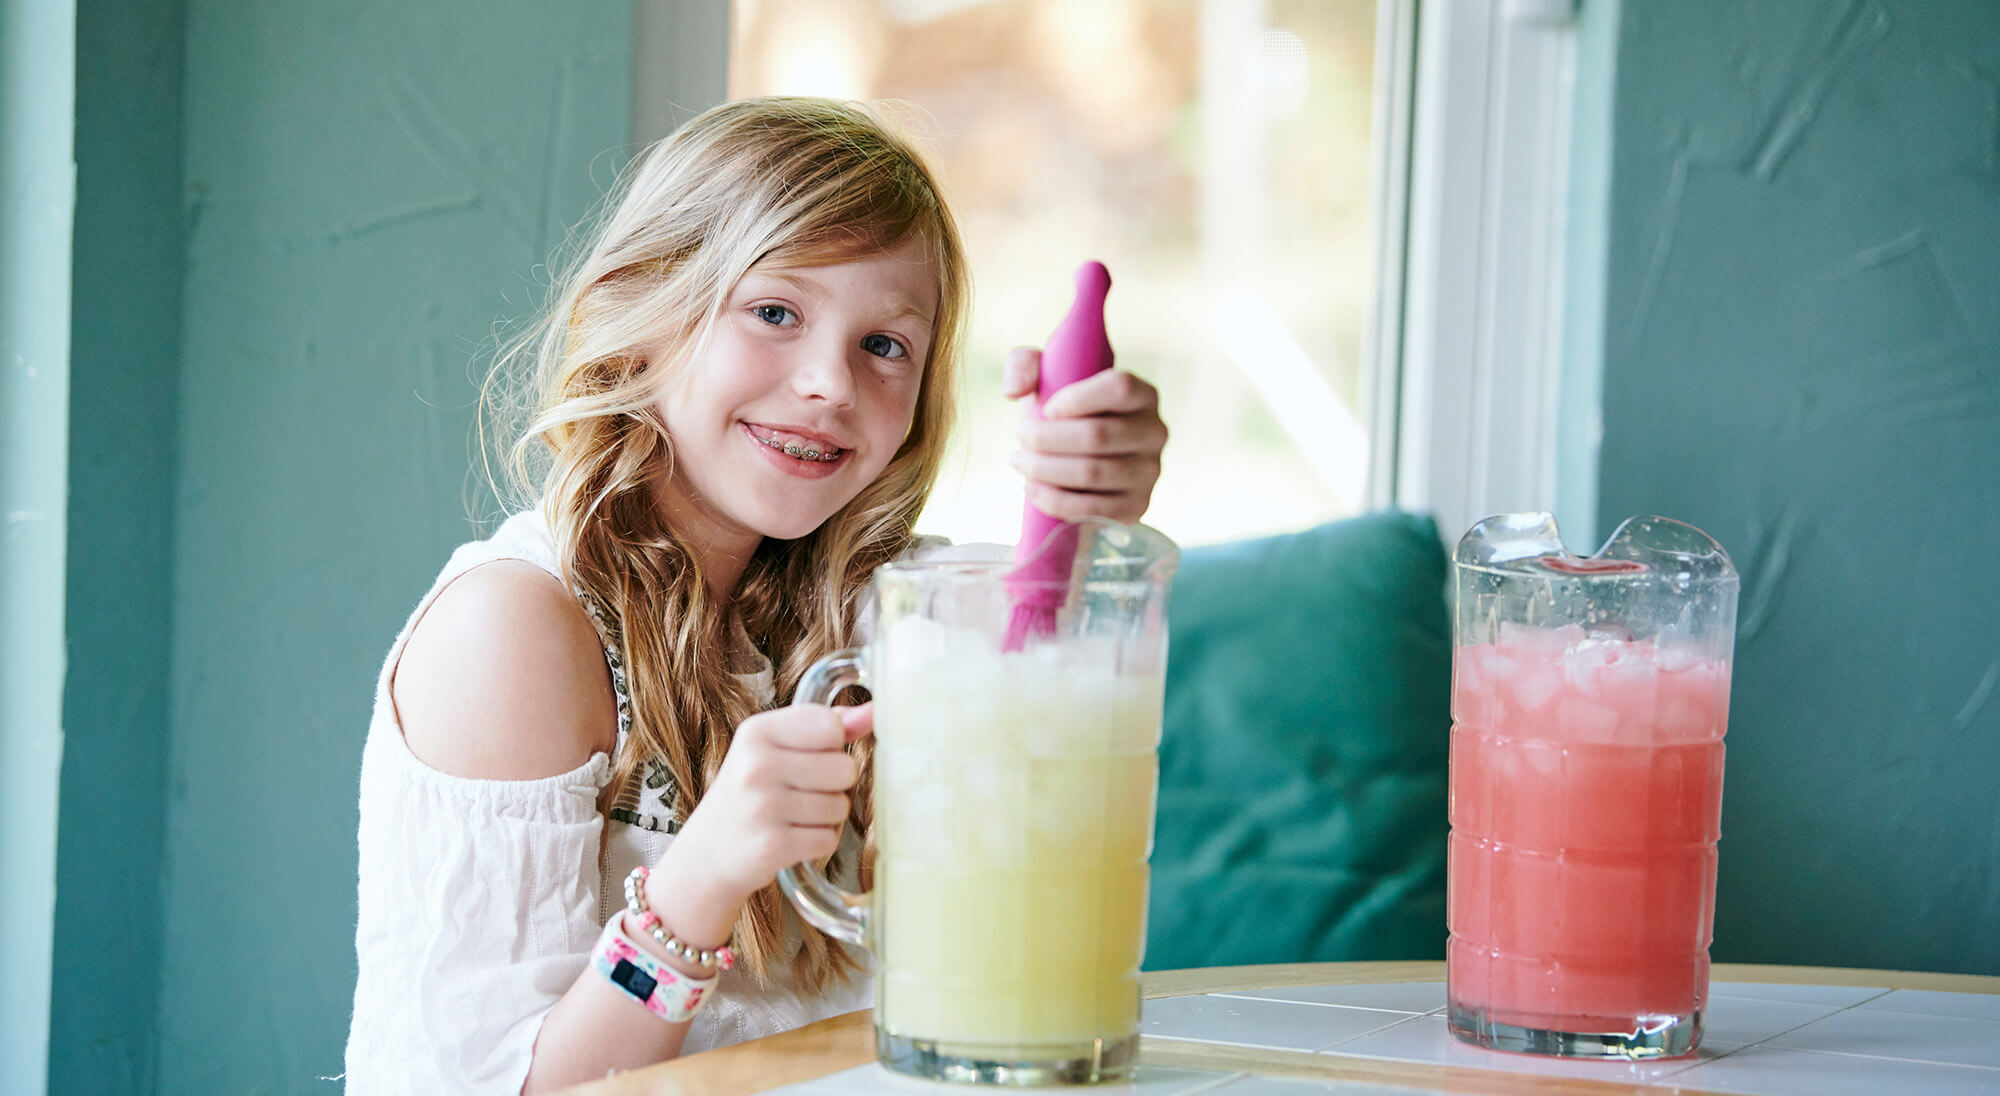 Young girl smiling while making lemonade